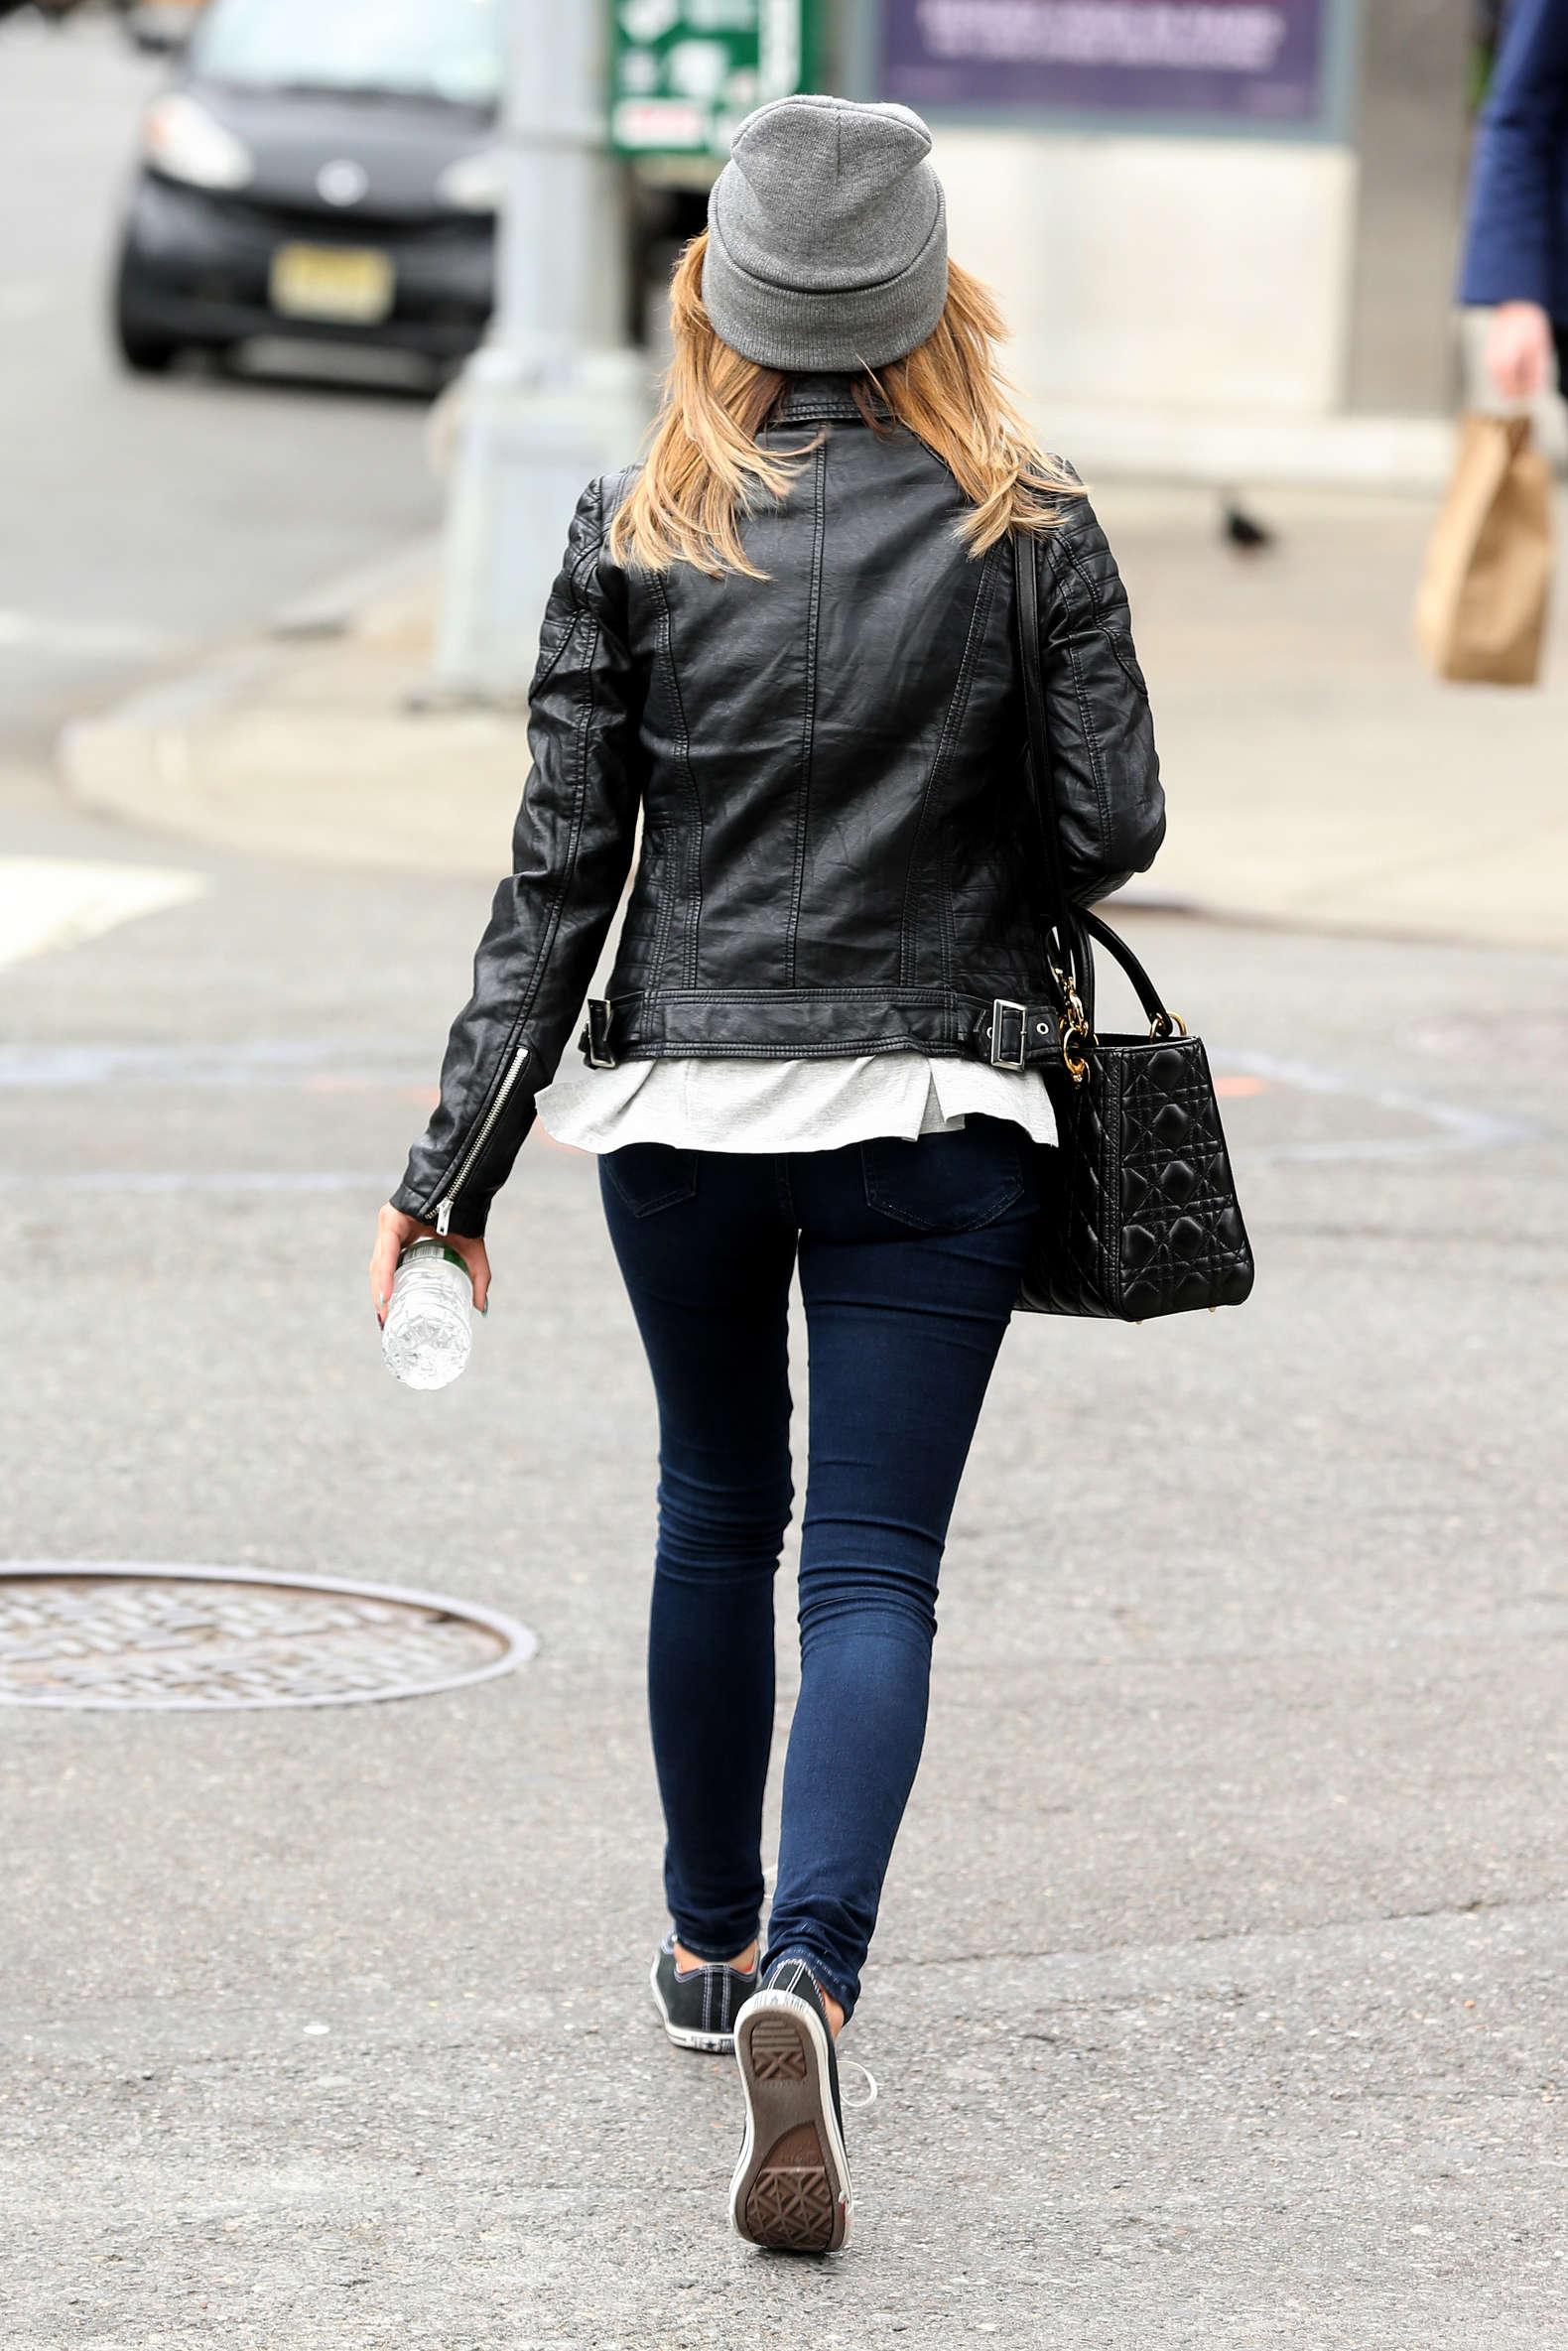 sarah hyland in jeans 16 � gotceleb